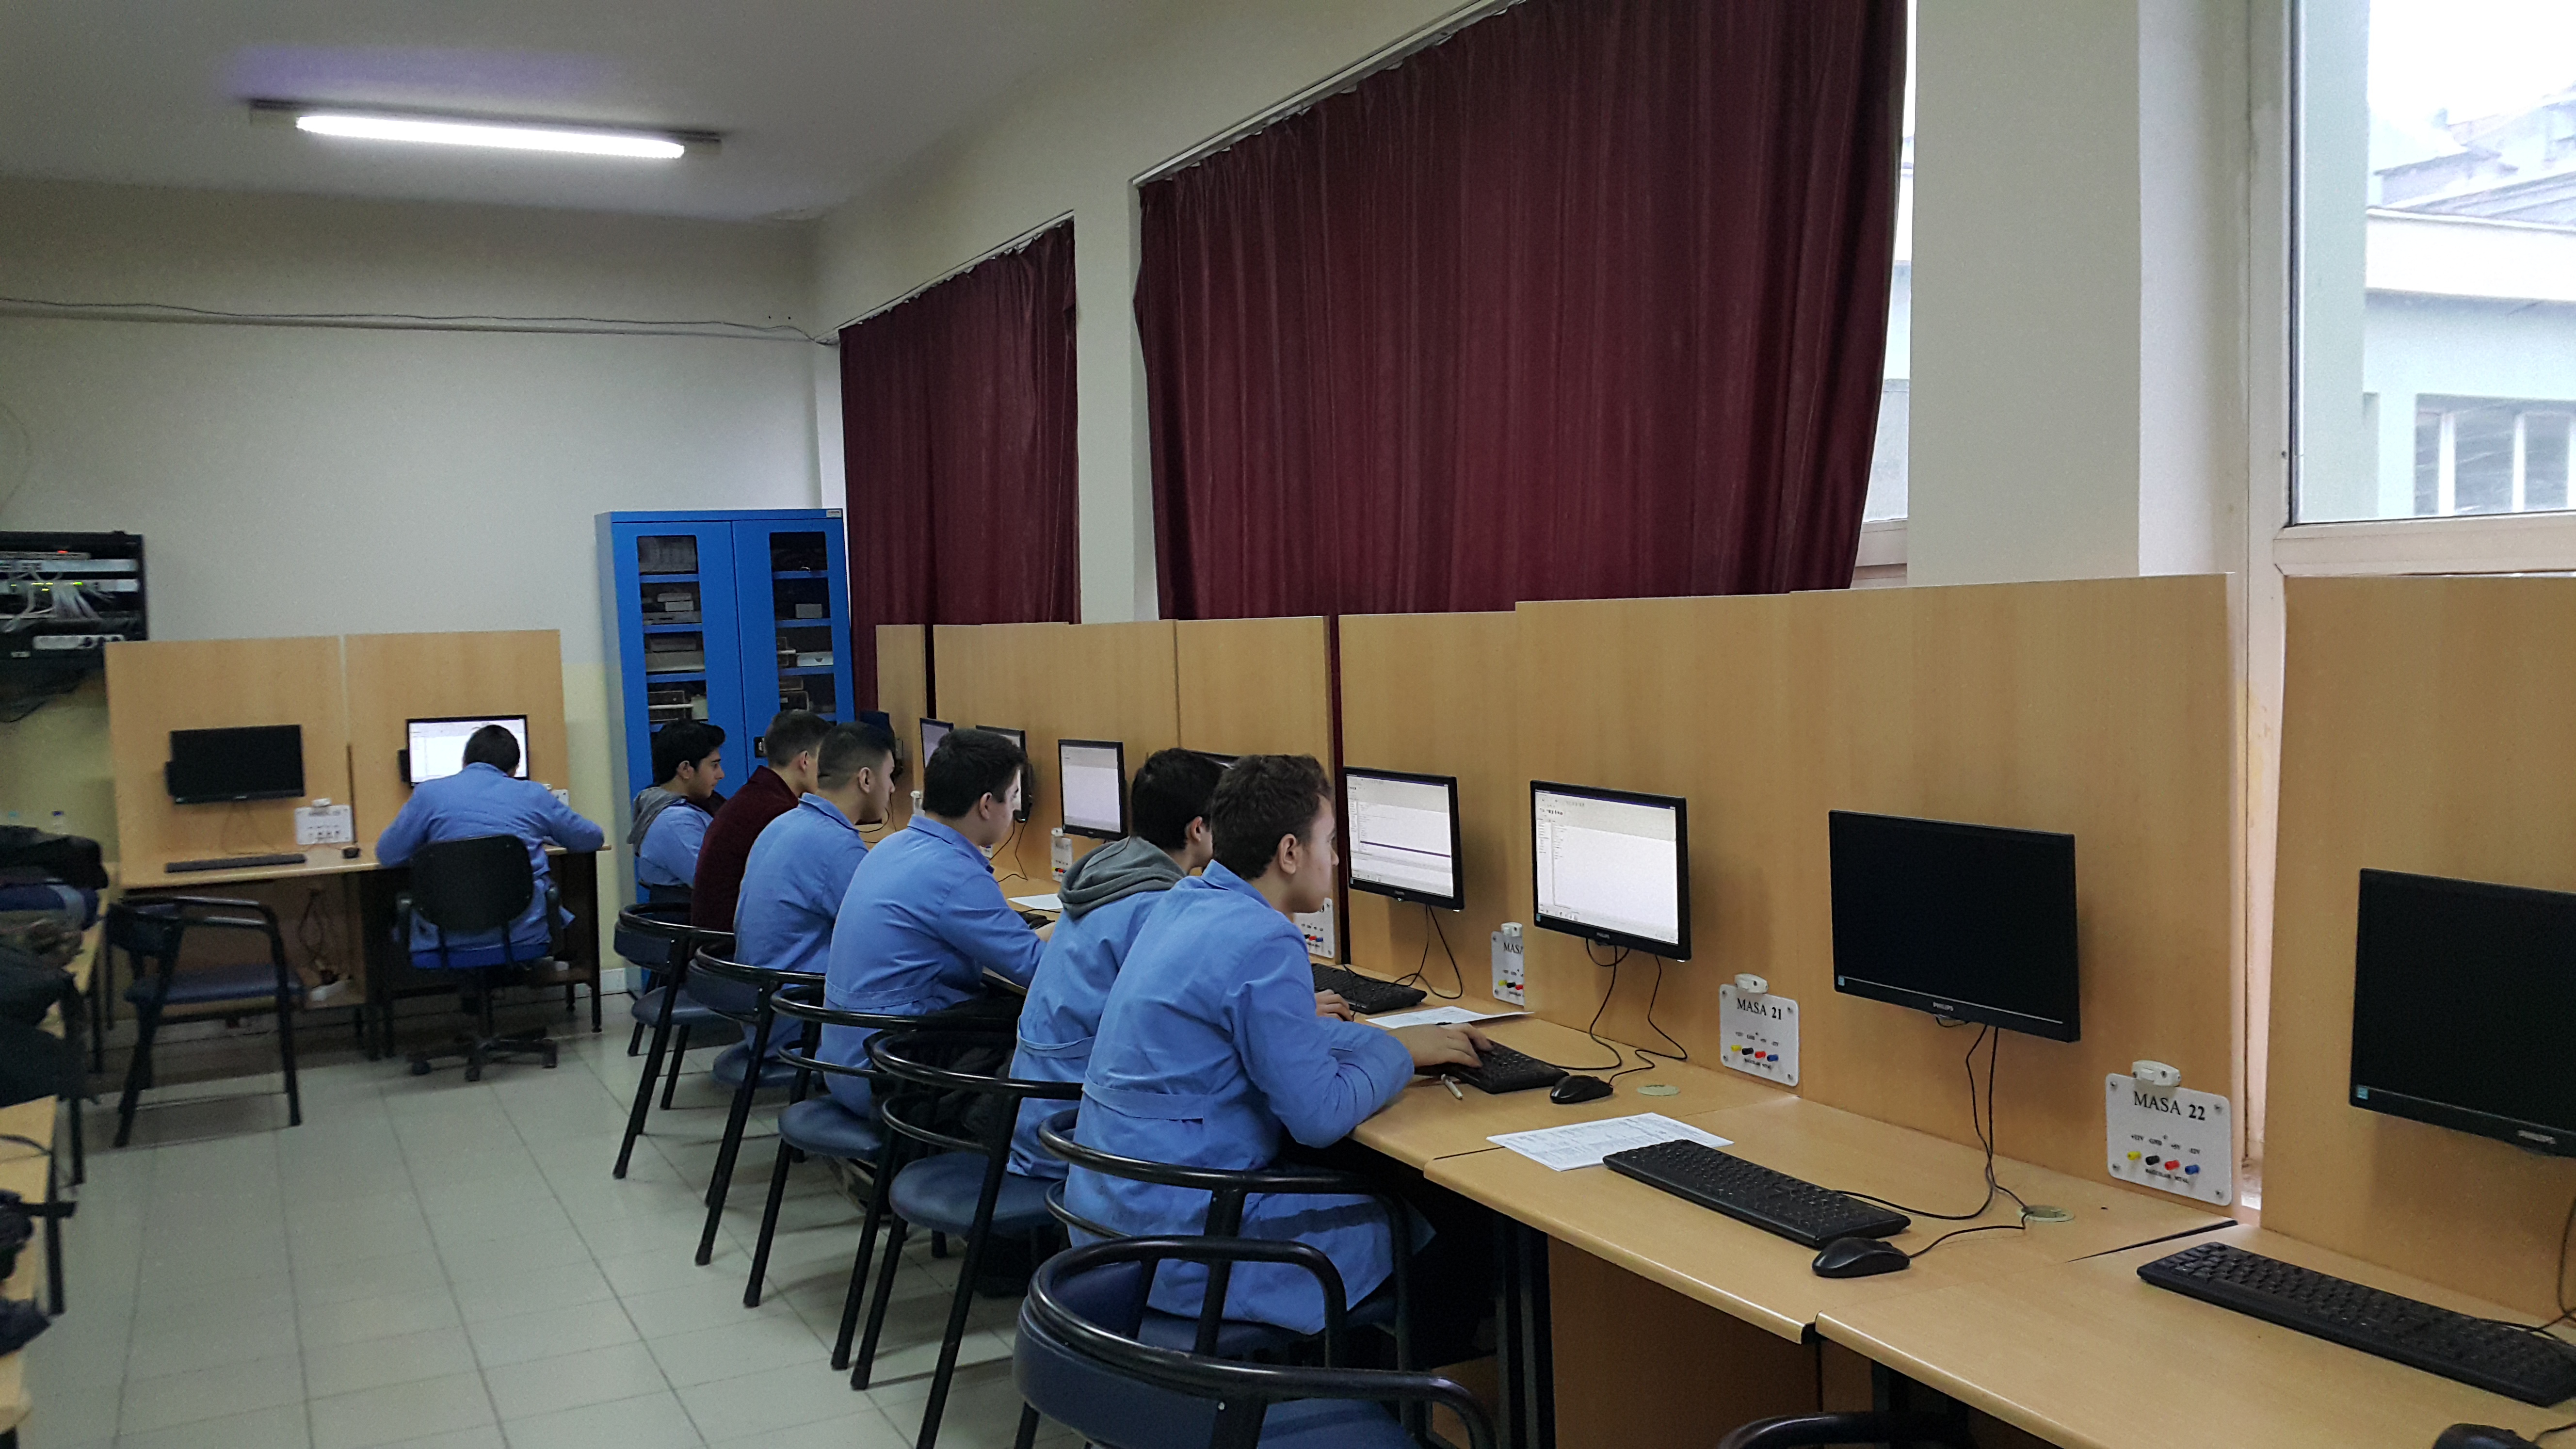 Bagcilar-Vocational-And-Technical-High-School-In-Turkey2.jpg